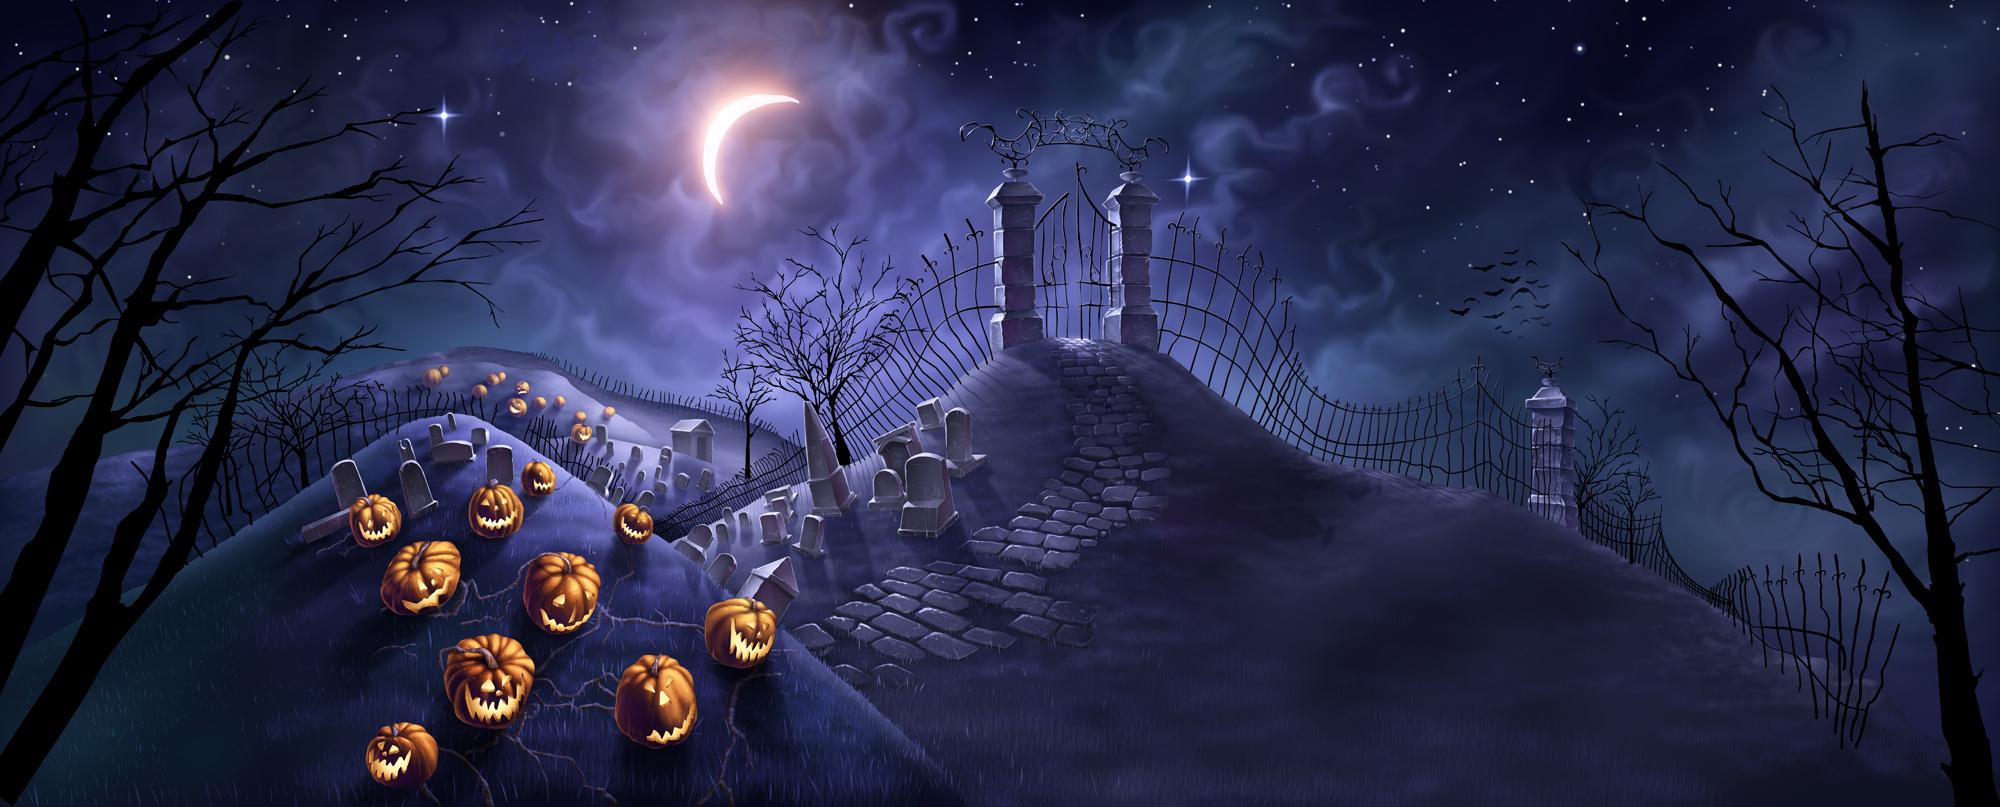 Halloween 2013 Backgrounds Wallpapers 2000x807